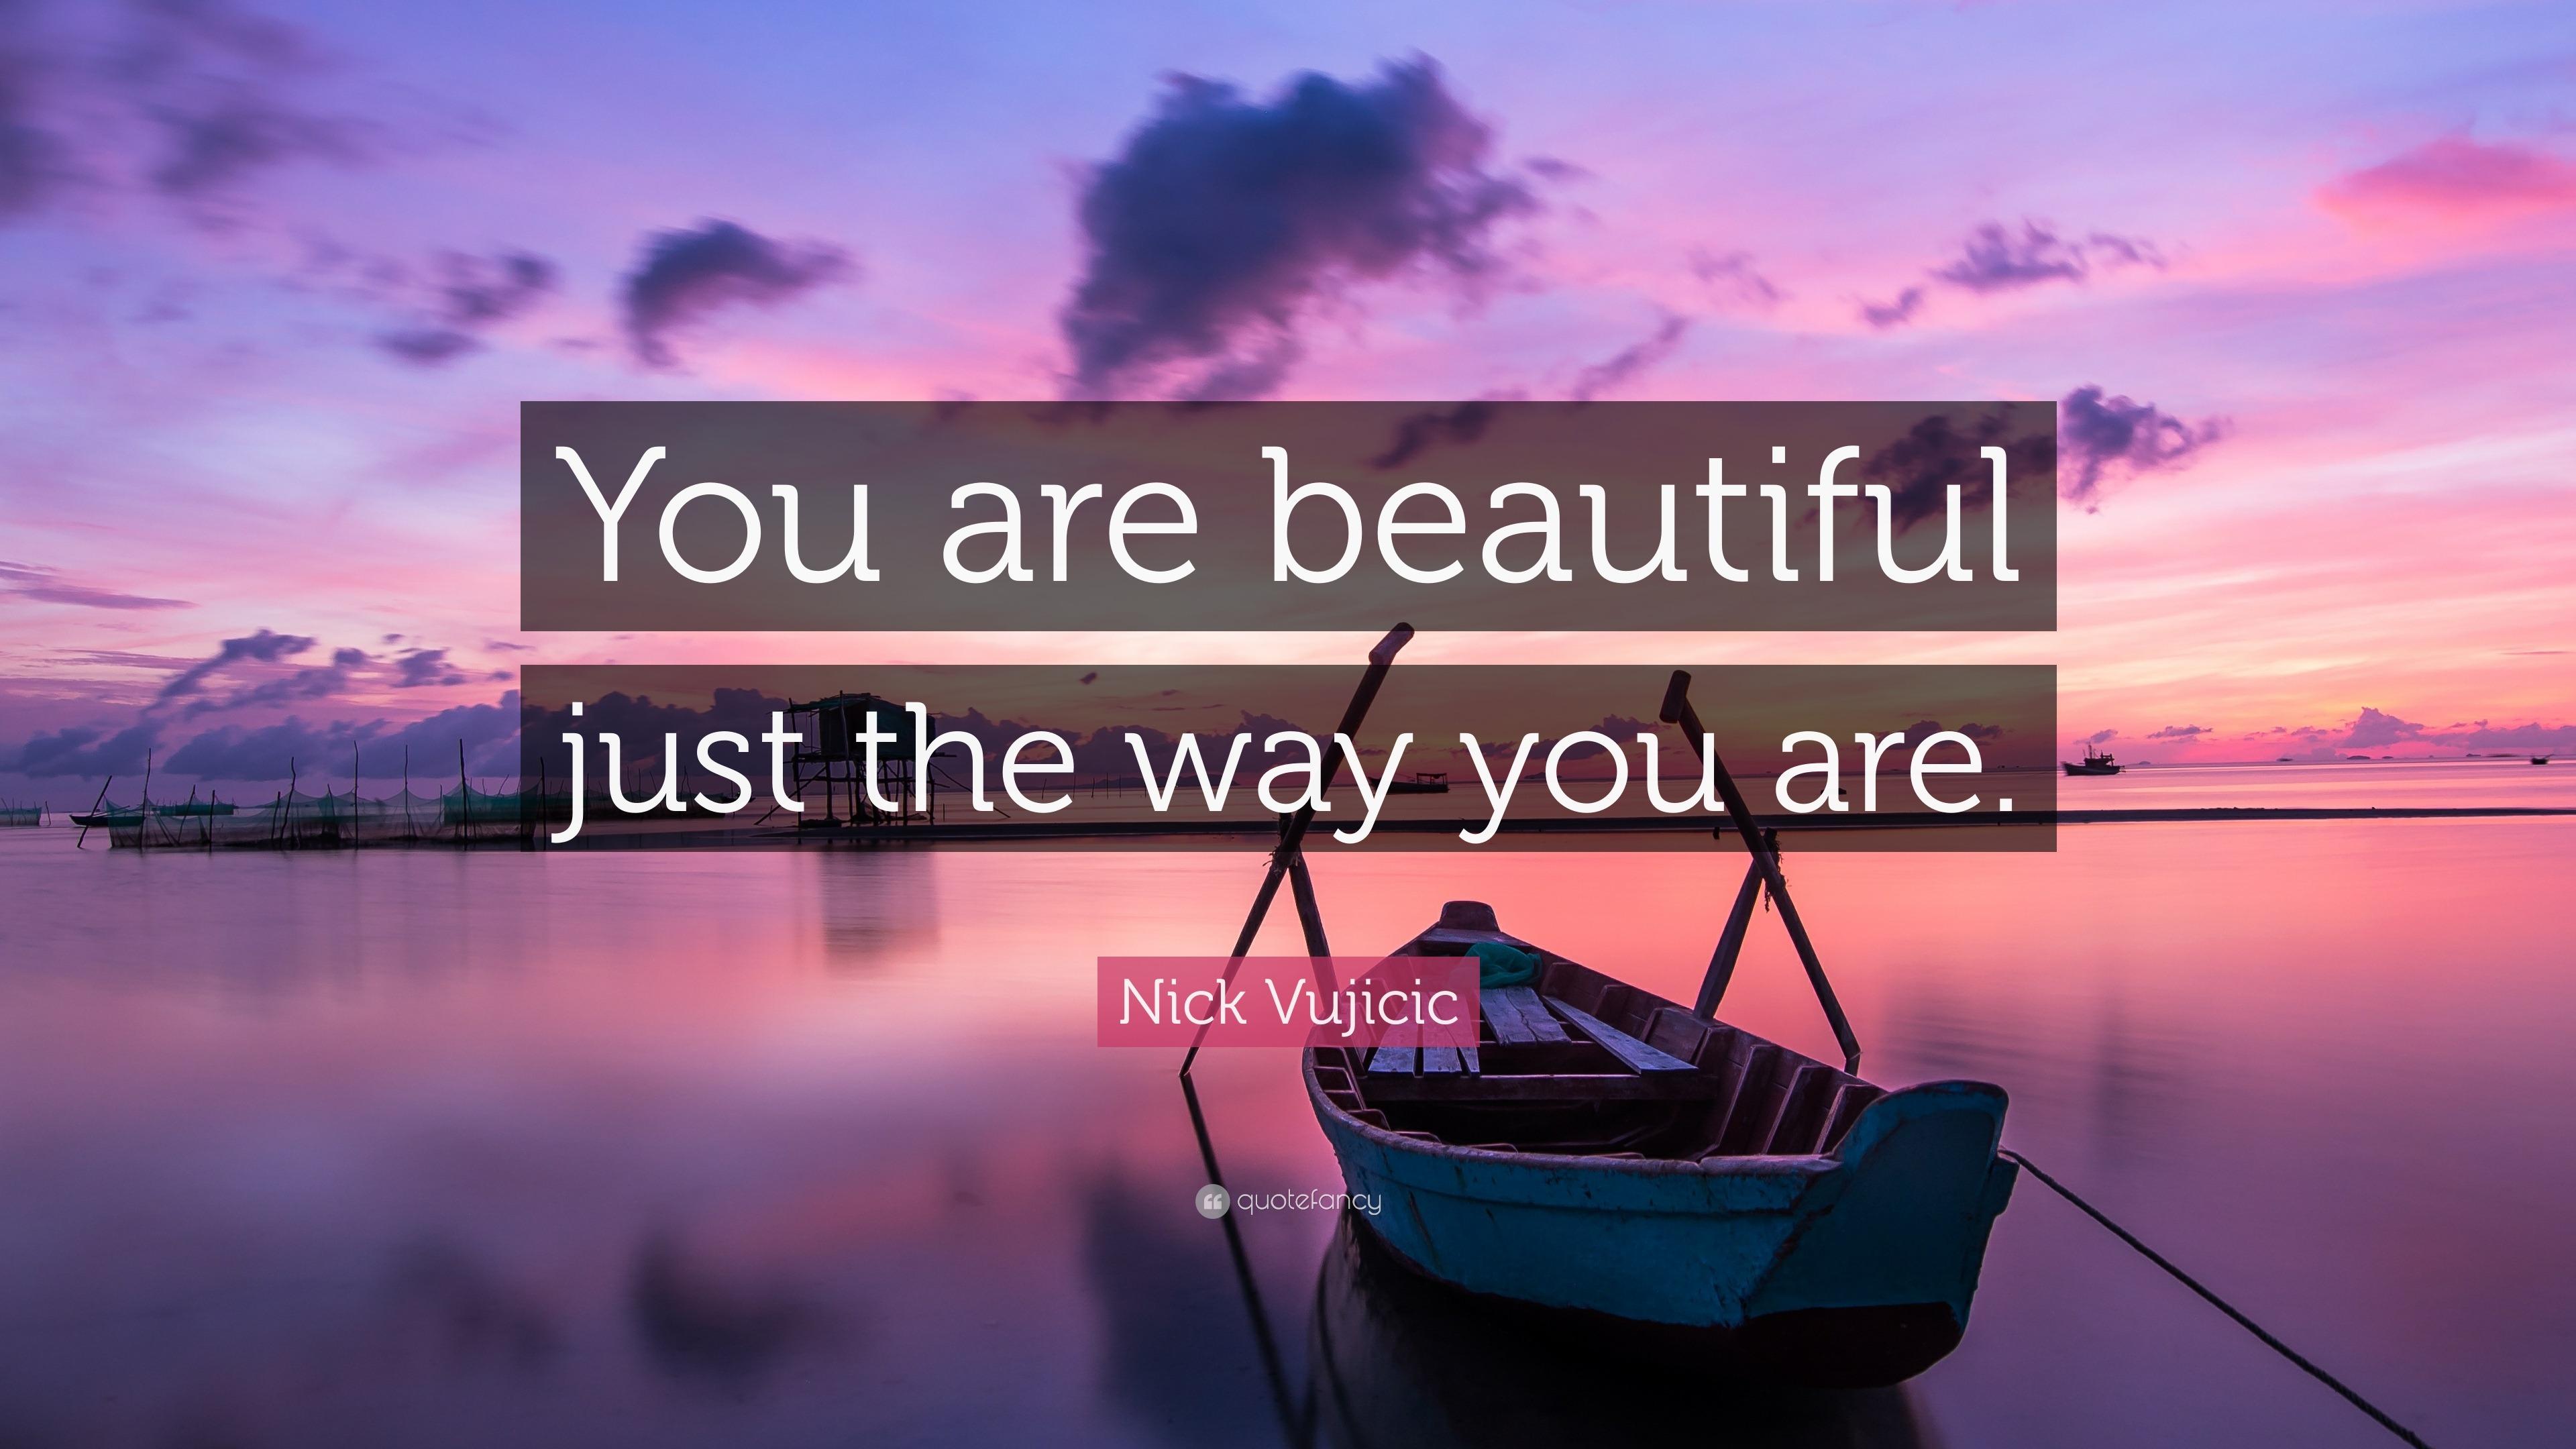 Nick Vujicic Quotes Wallpaper Nick Vujicic Quote You Are Beautiful Just The Way You